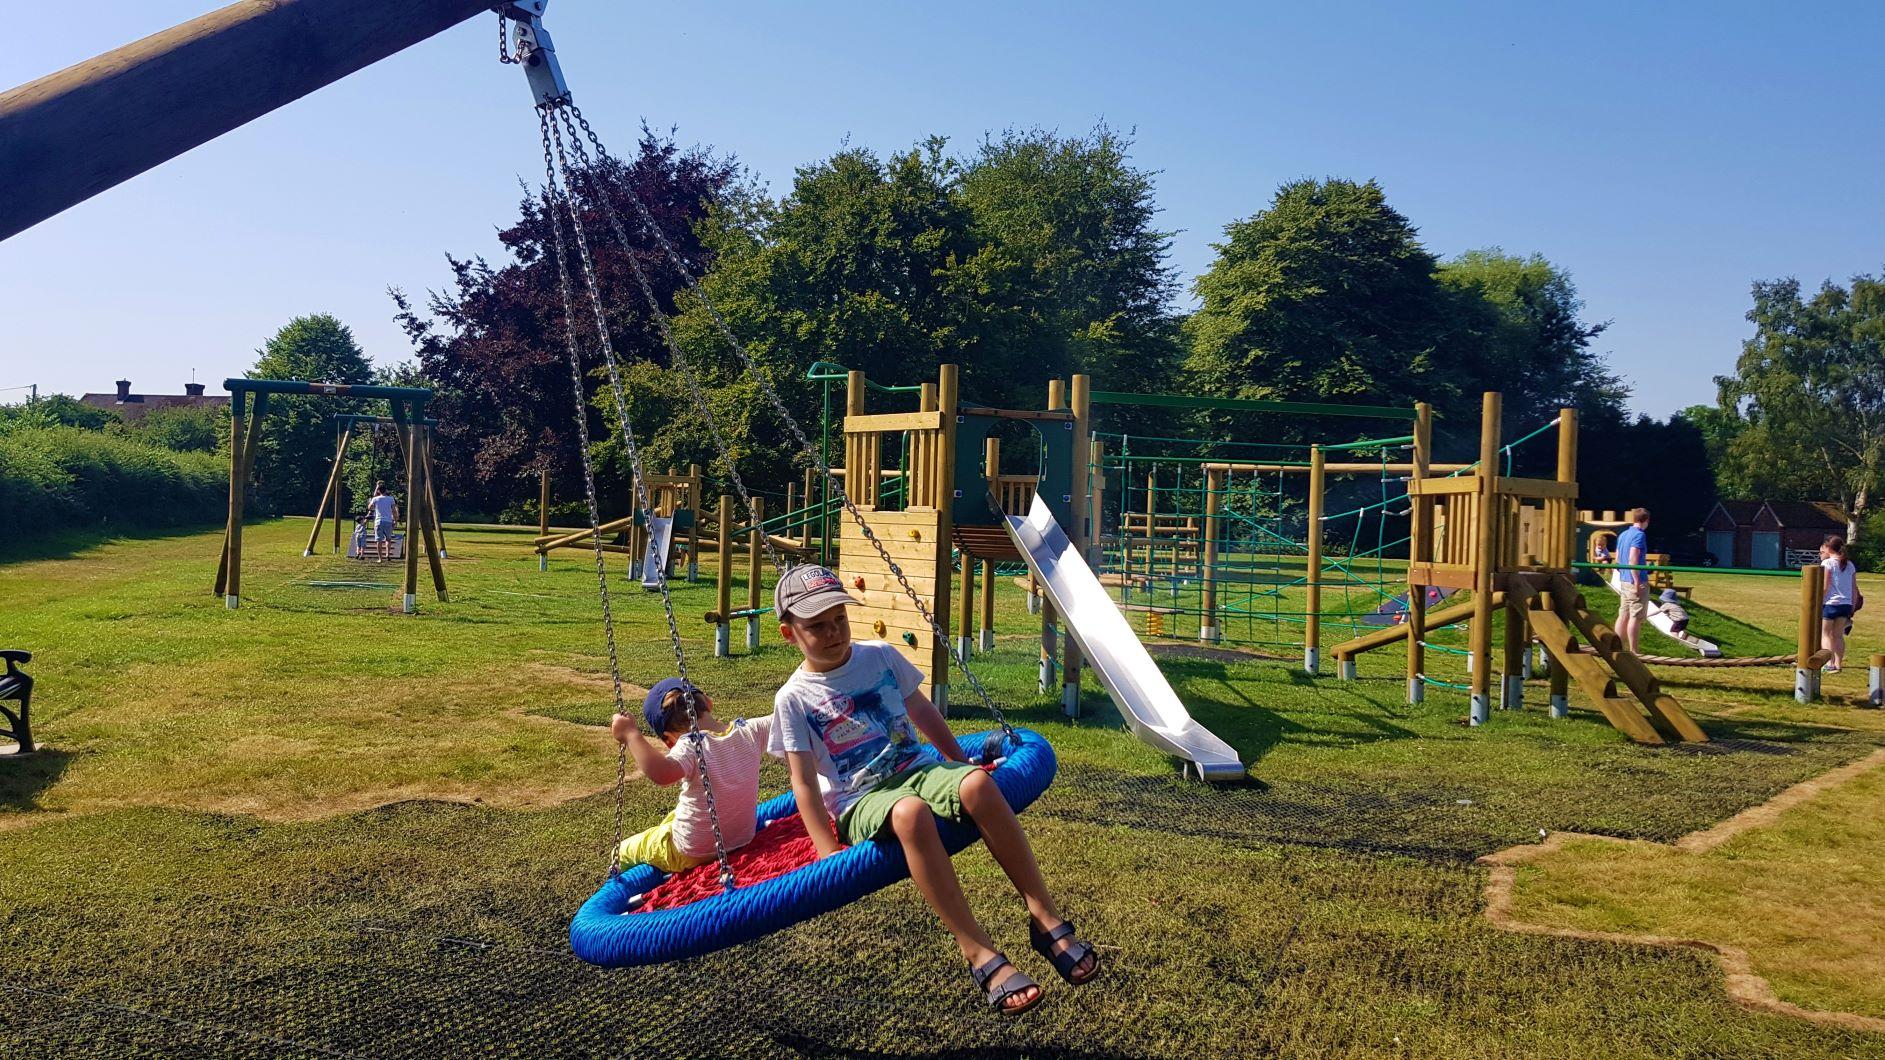 Warborough Play Park